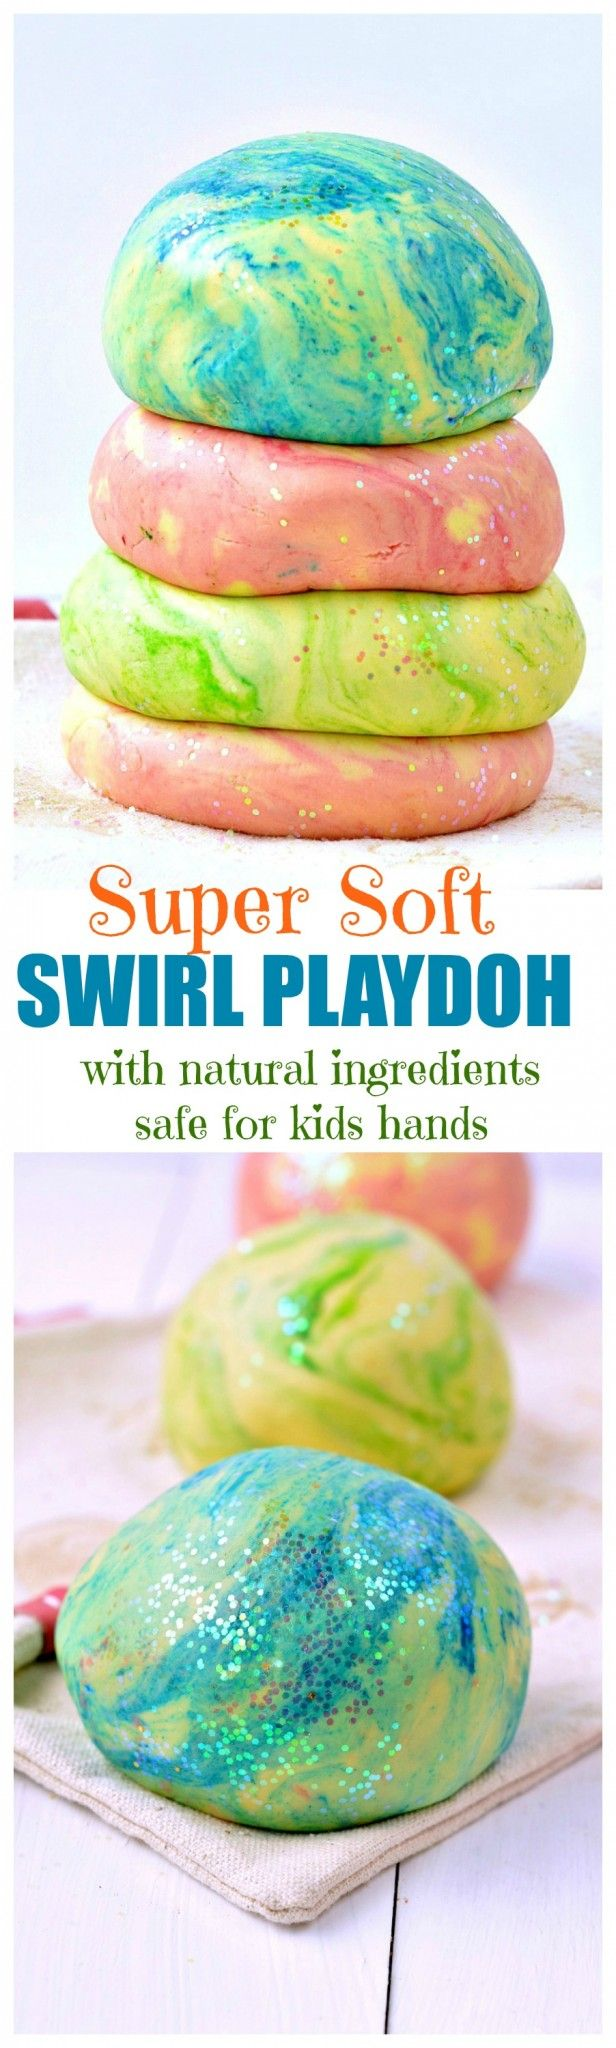 Supersoft Swirl Playdough